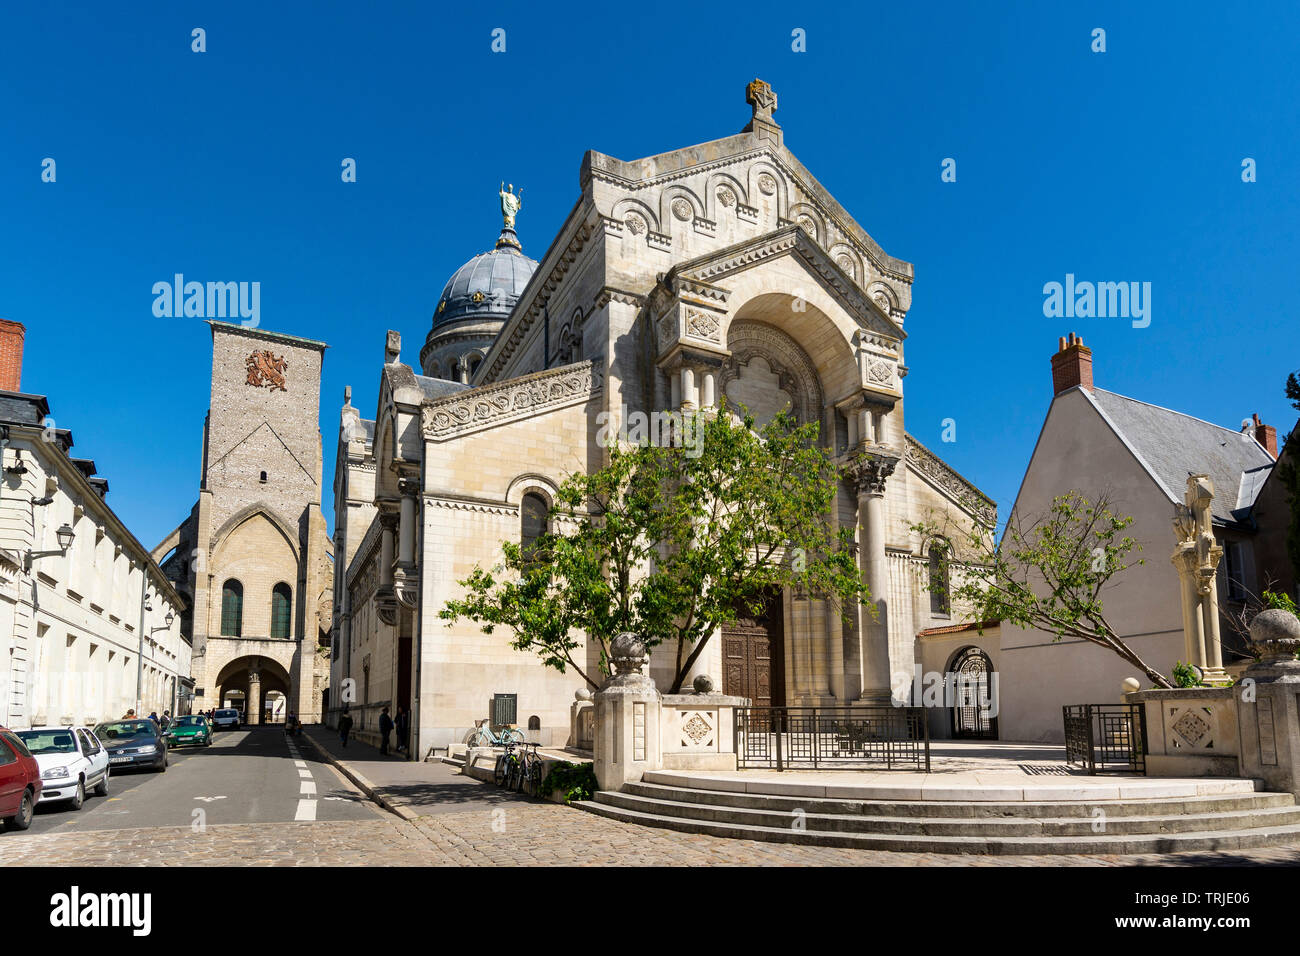 Tours city, Charlemagne Tower and Basilique Saint Martin built to pay tribute to Saint Martin, Indre et Loire, Centre Val Loire, France - Stock Image